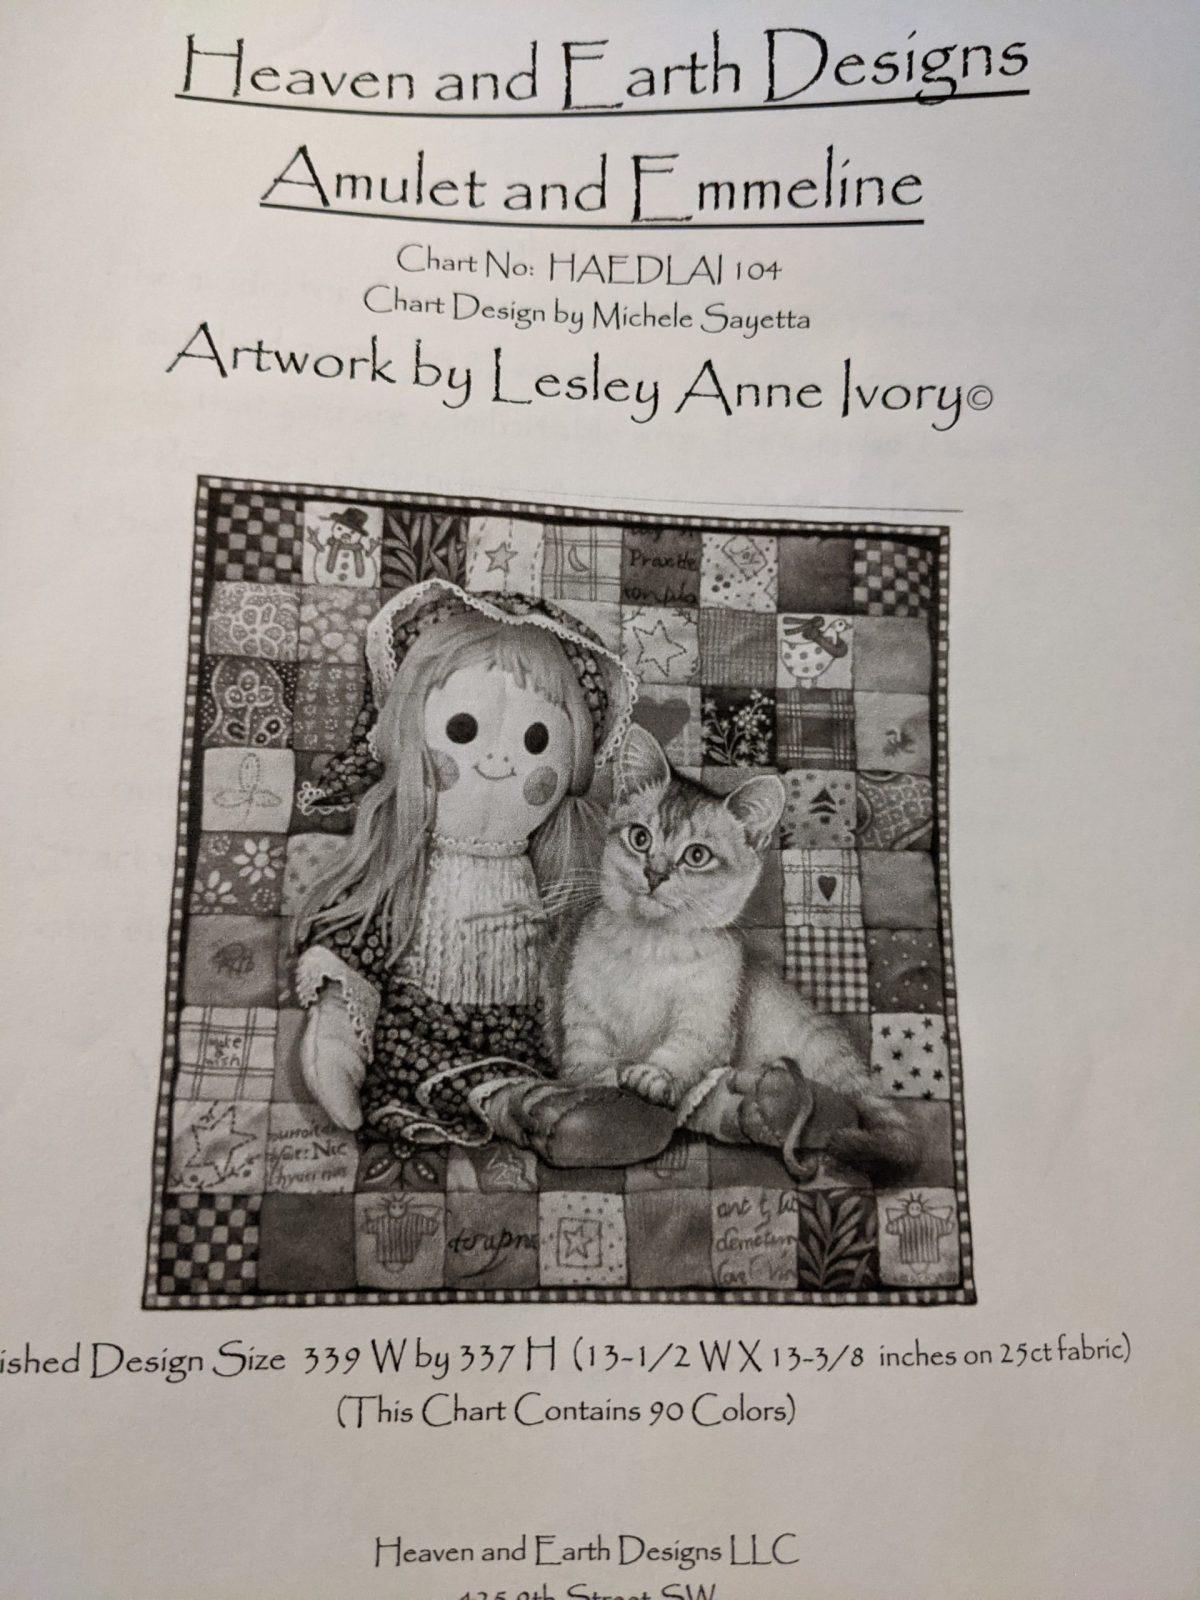 Amulet and Emmeline